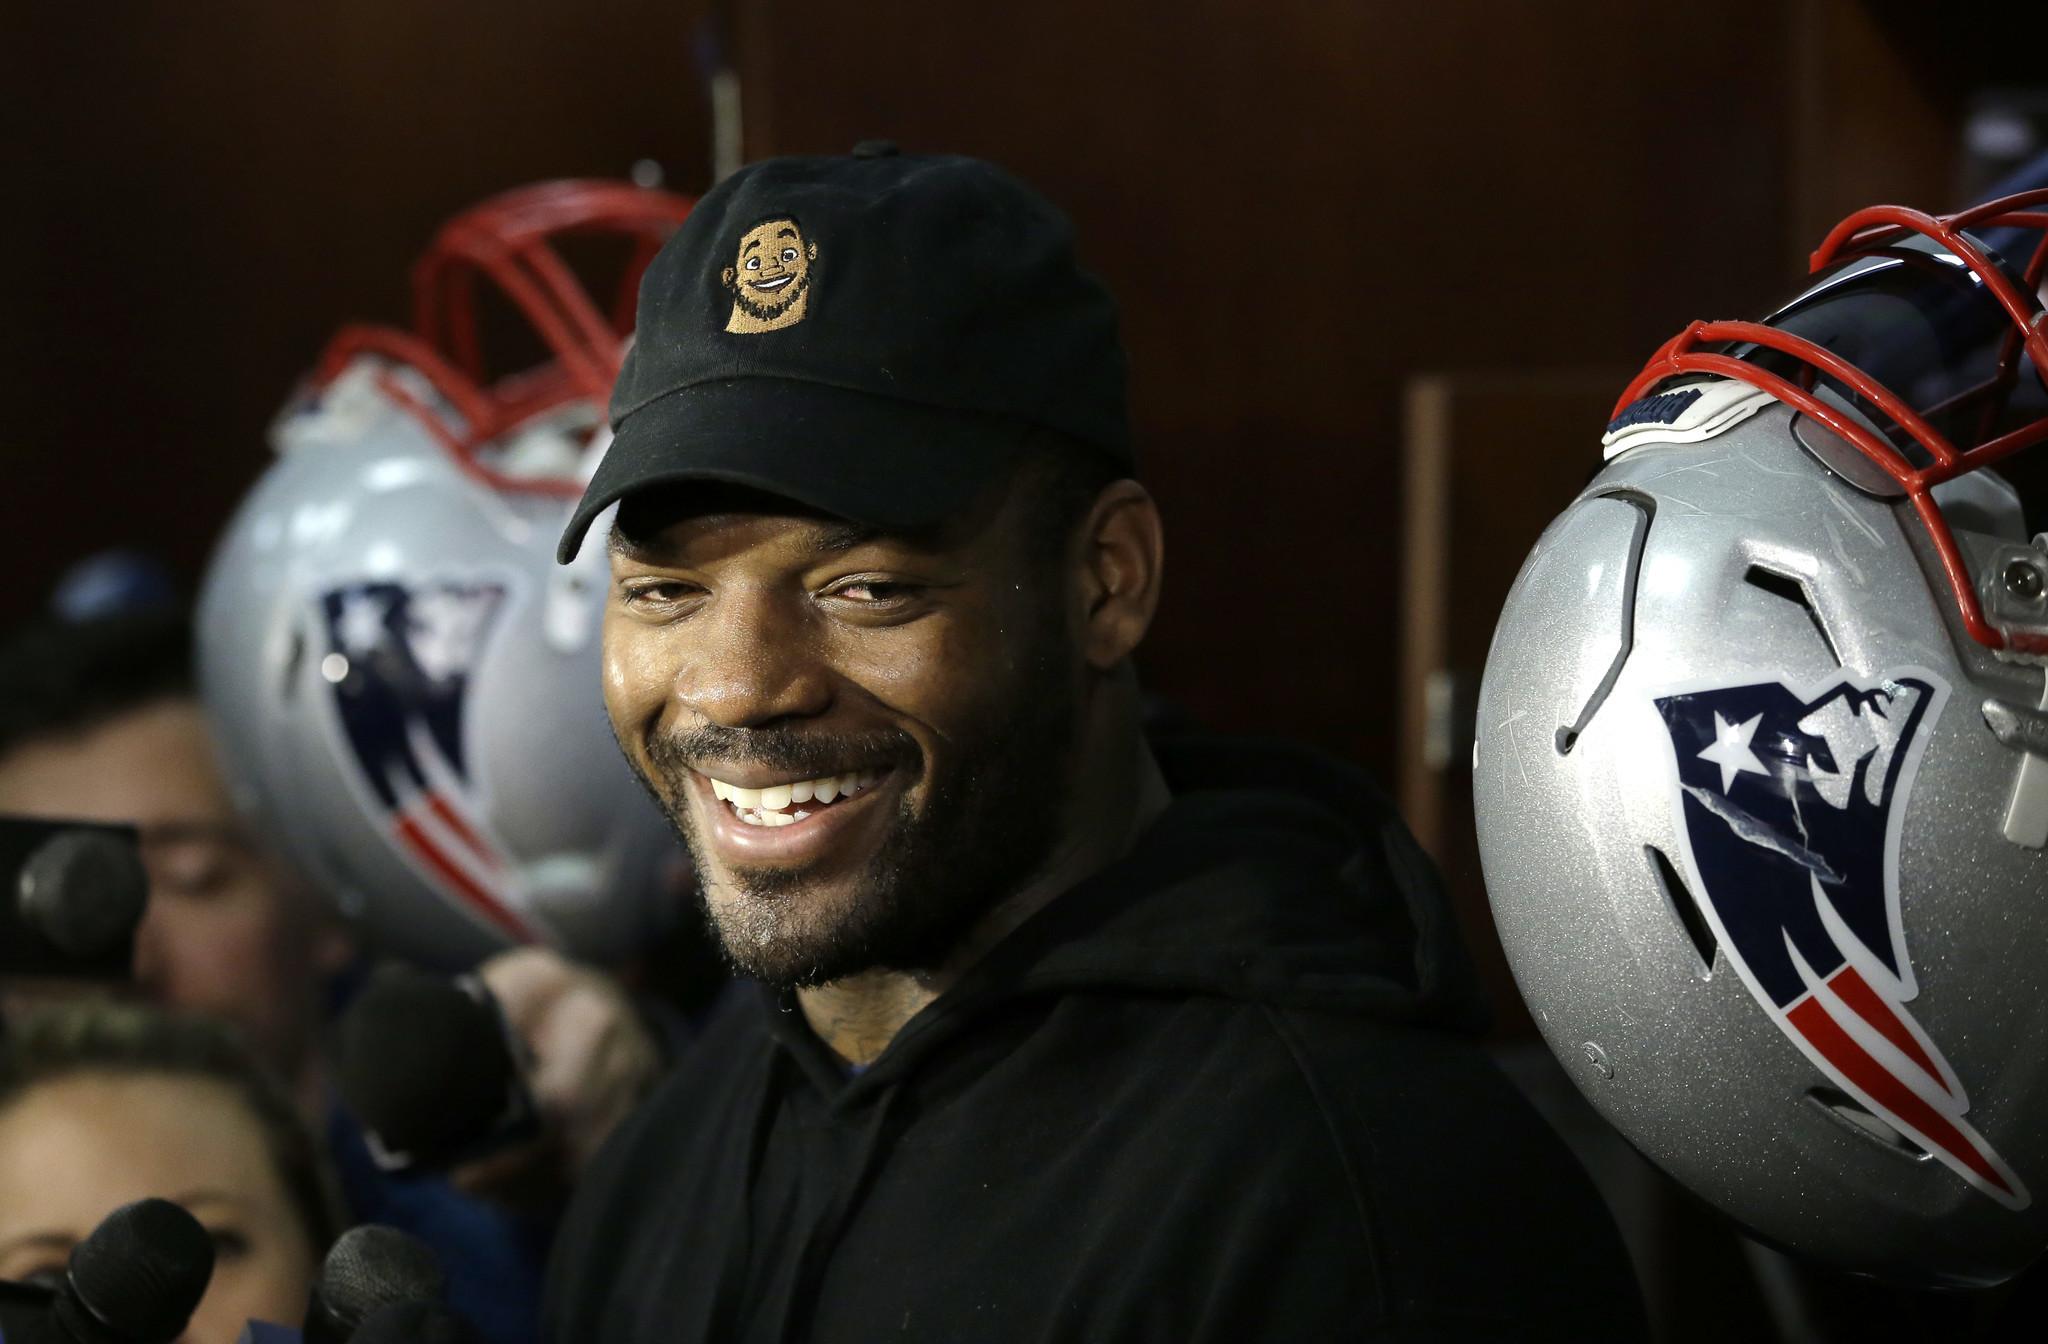 Former Bears TE Martellus Bennett foremost among Patriots free